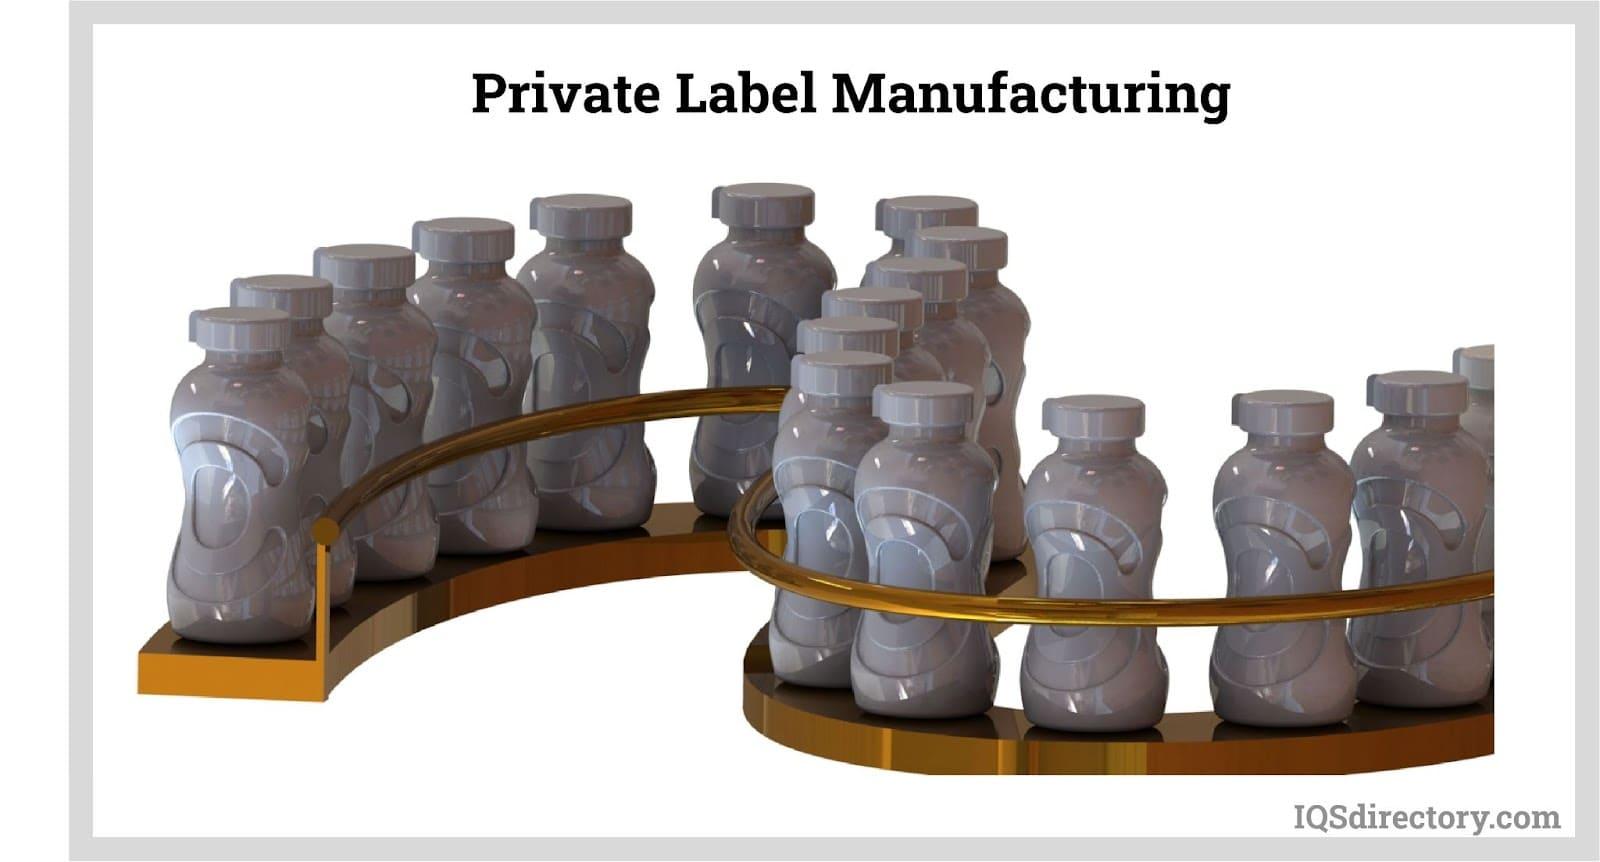 Private Label Manufacturing